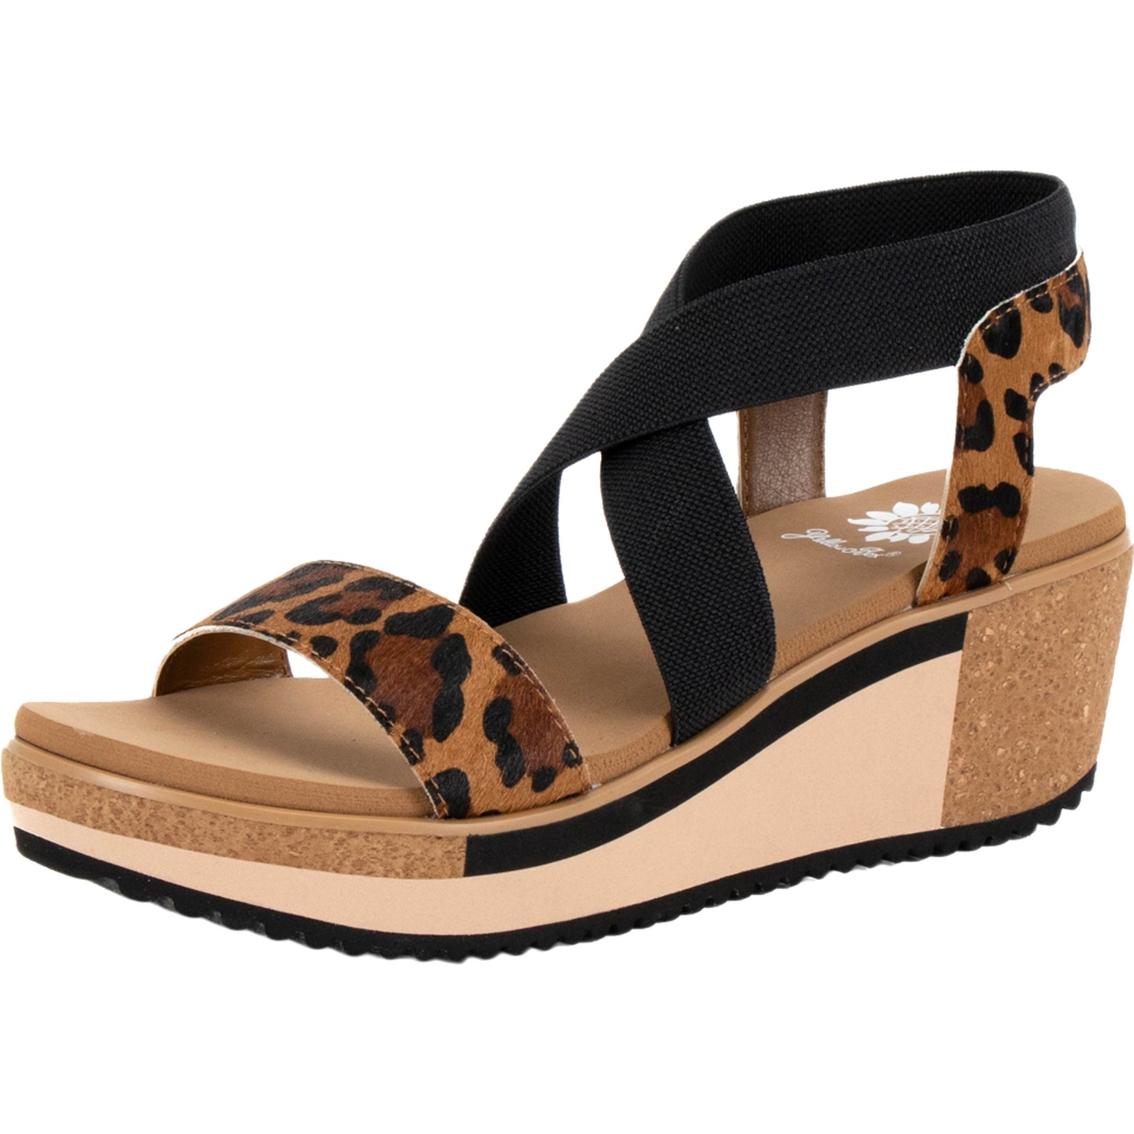 653ef78c4534 Yellow Box Janalee Strappy Wedge Sandals